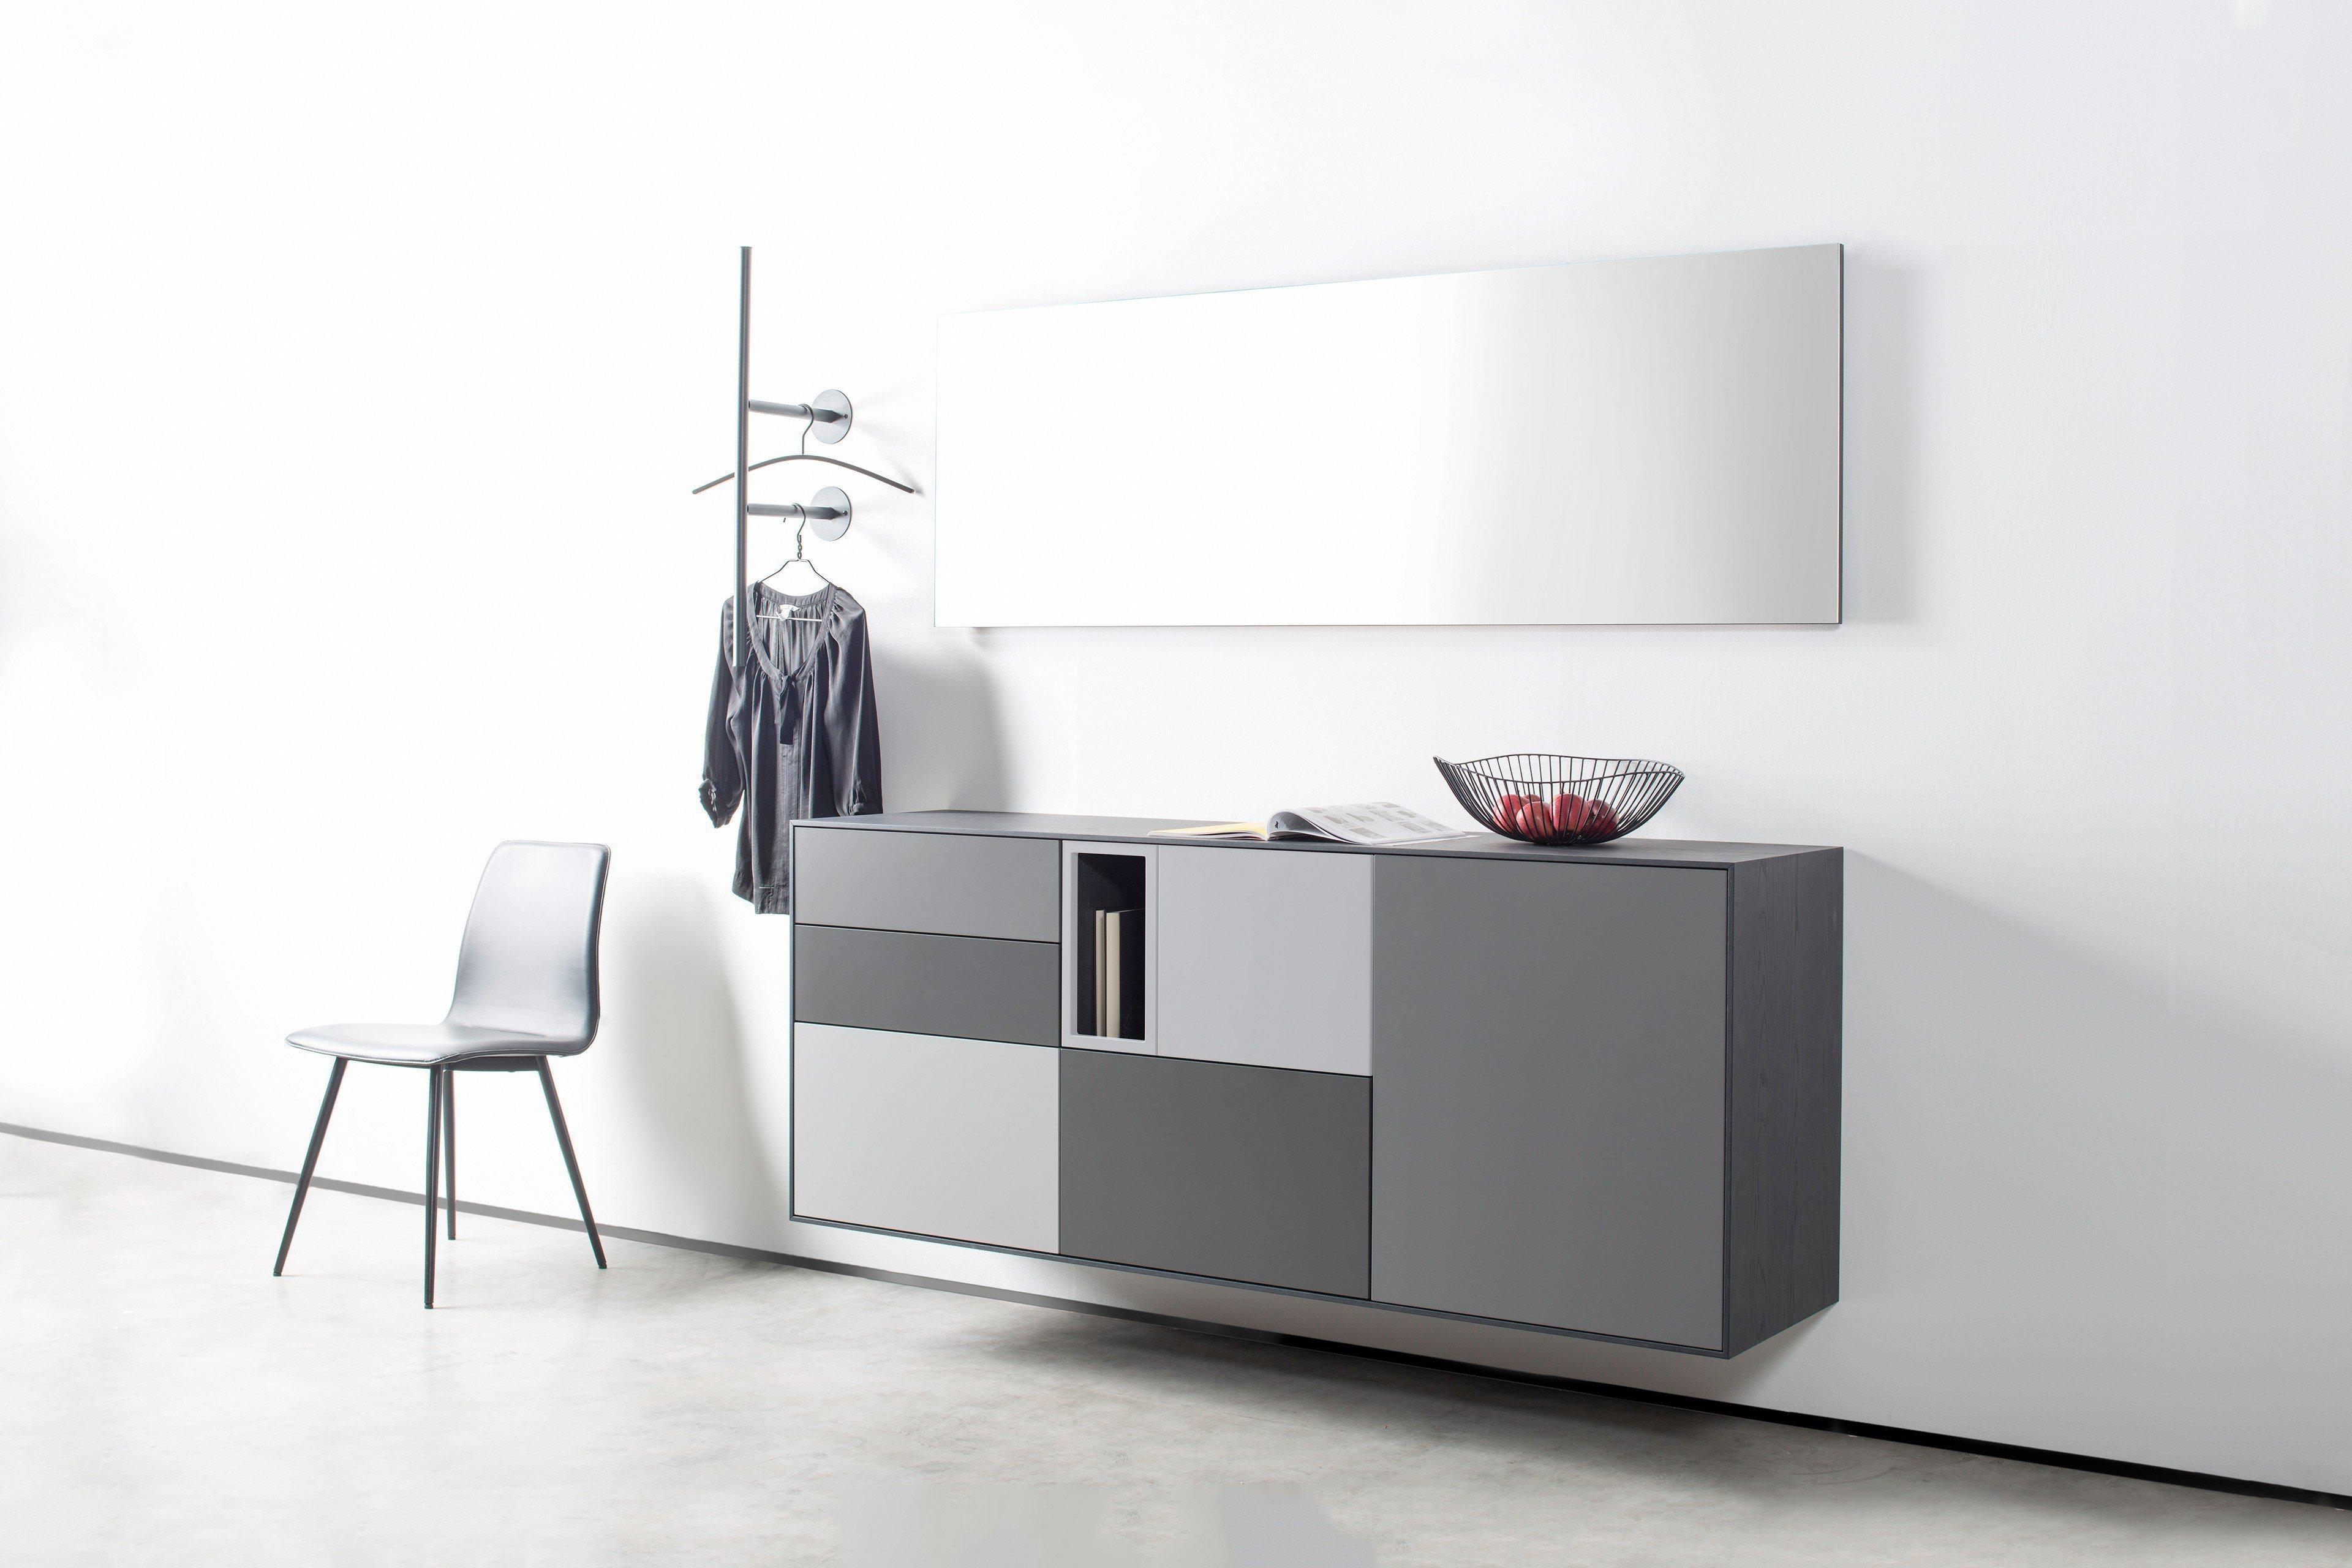 sudbrock garderobe game grau m bel letz ihr online shop. Black Bedroom Furniture Sets. Home Design Ideas